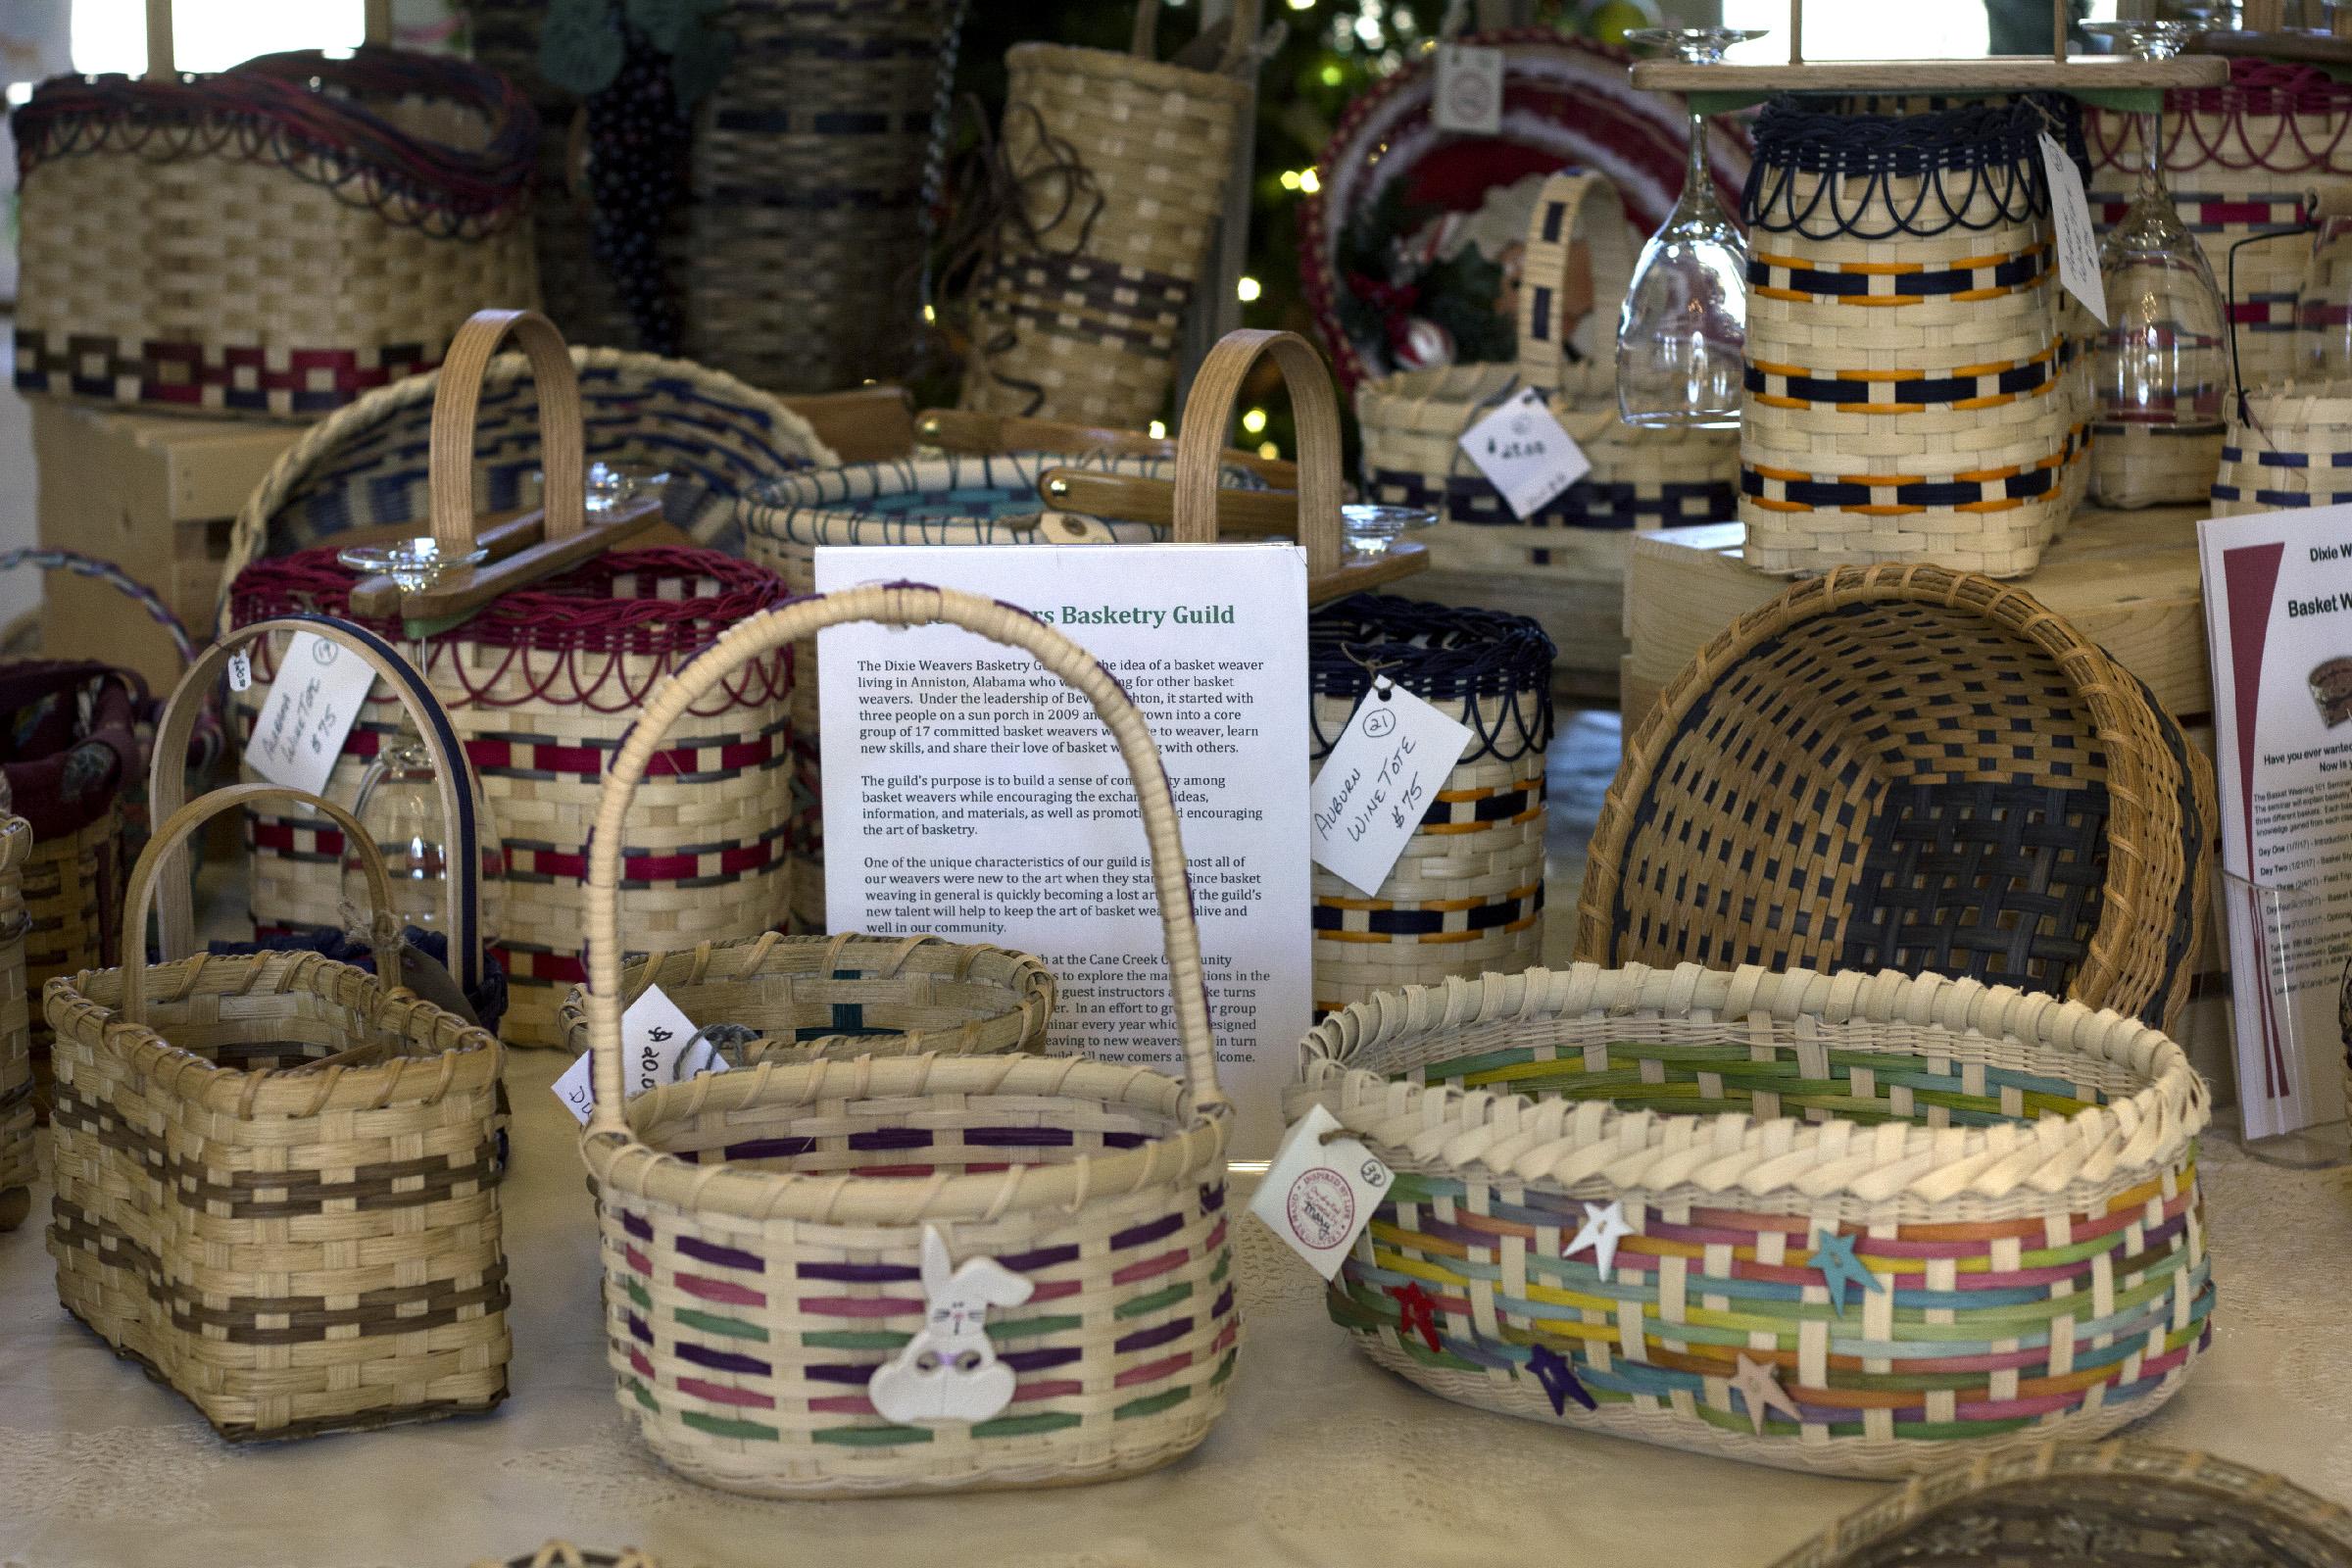 Dixie Weavers Basketry Guild 3-1